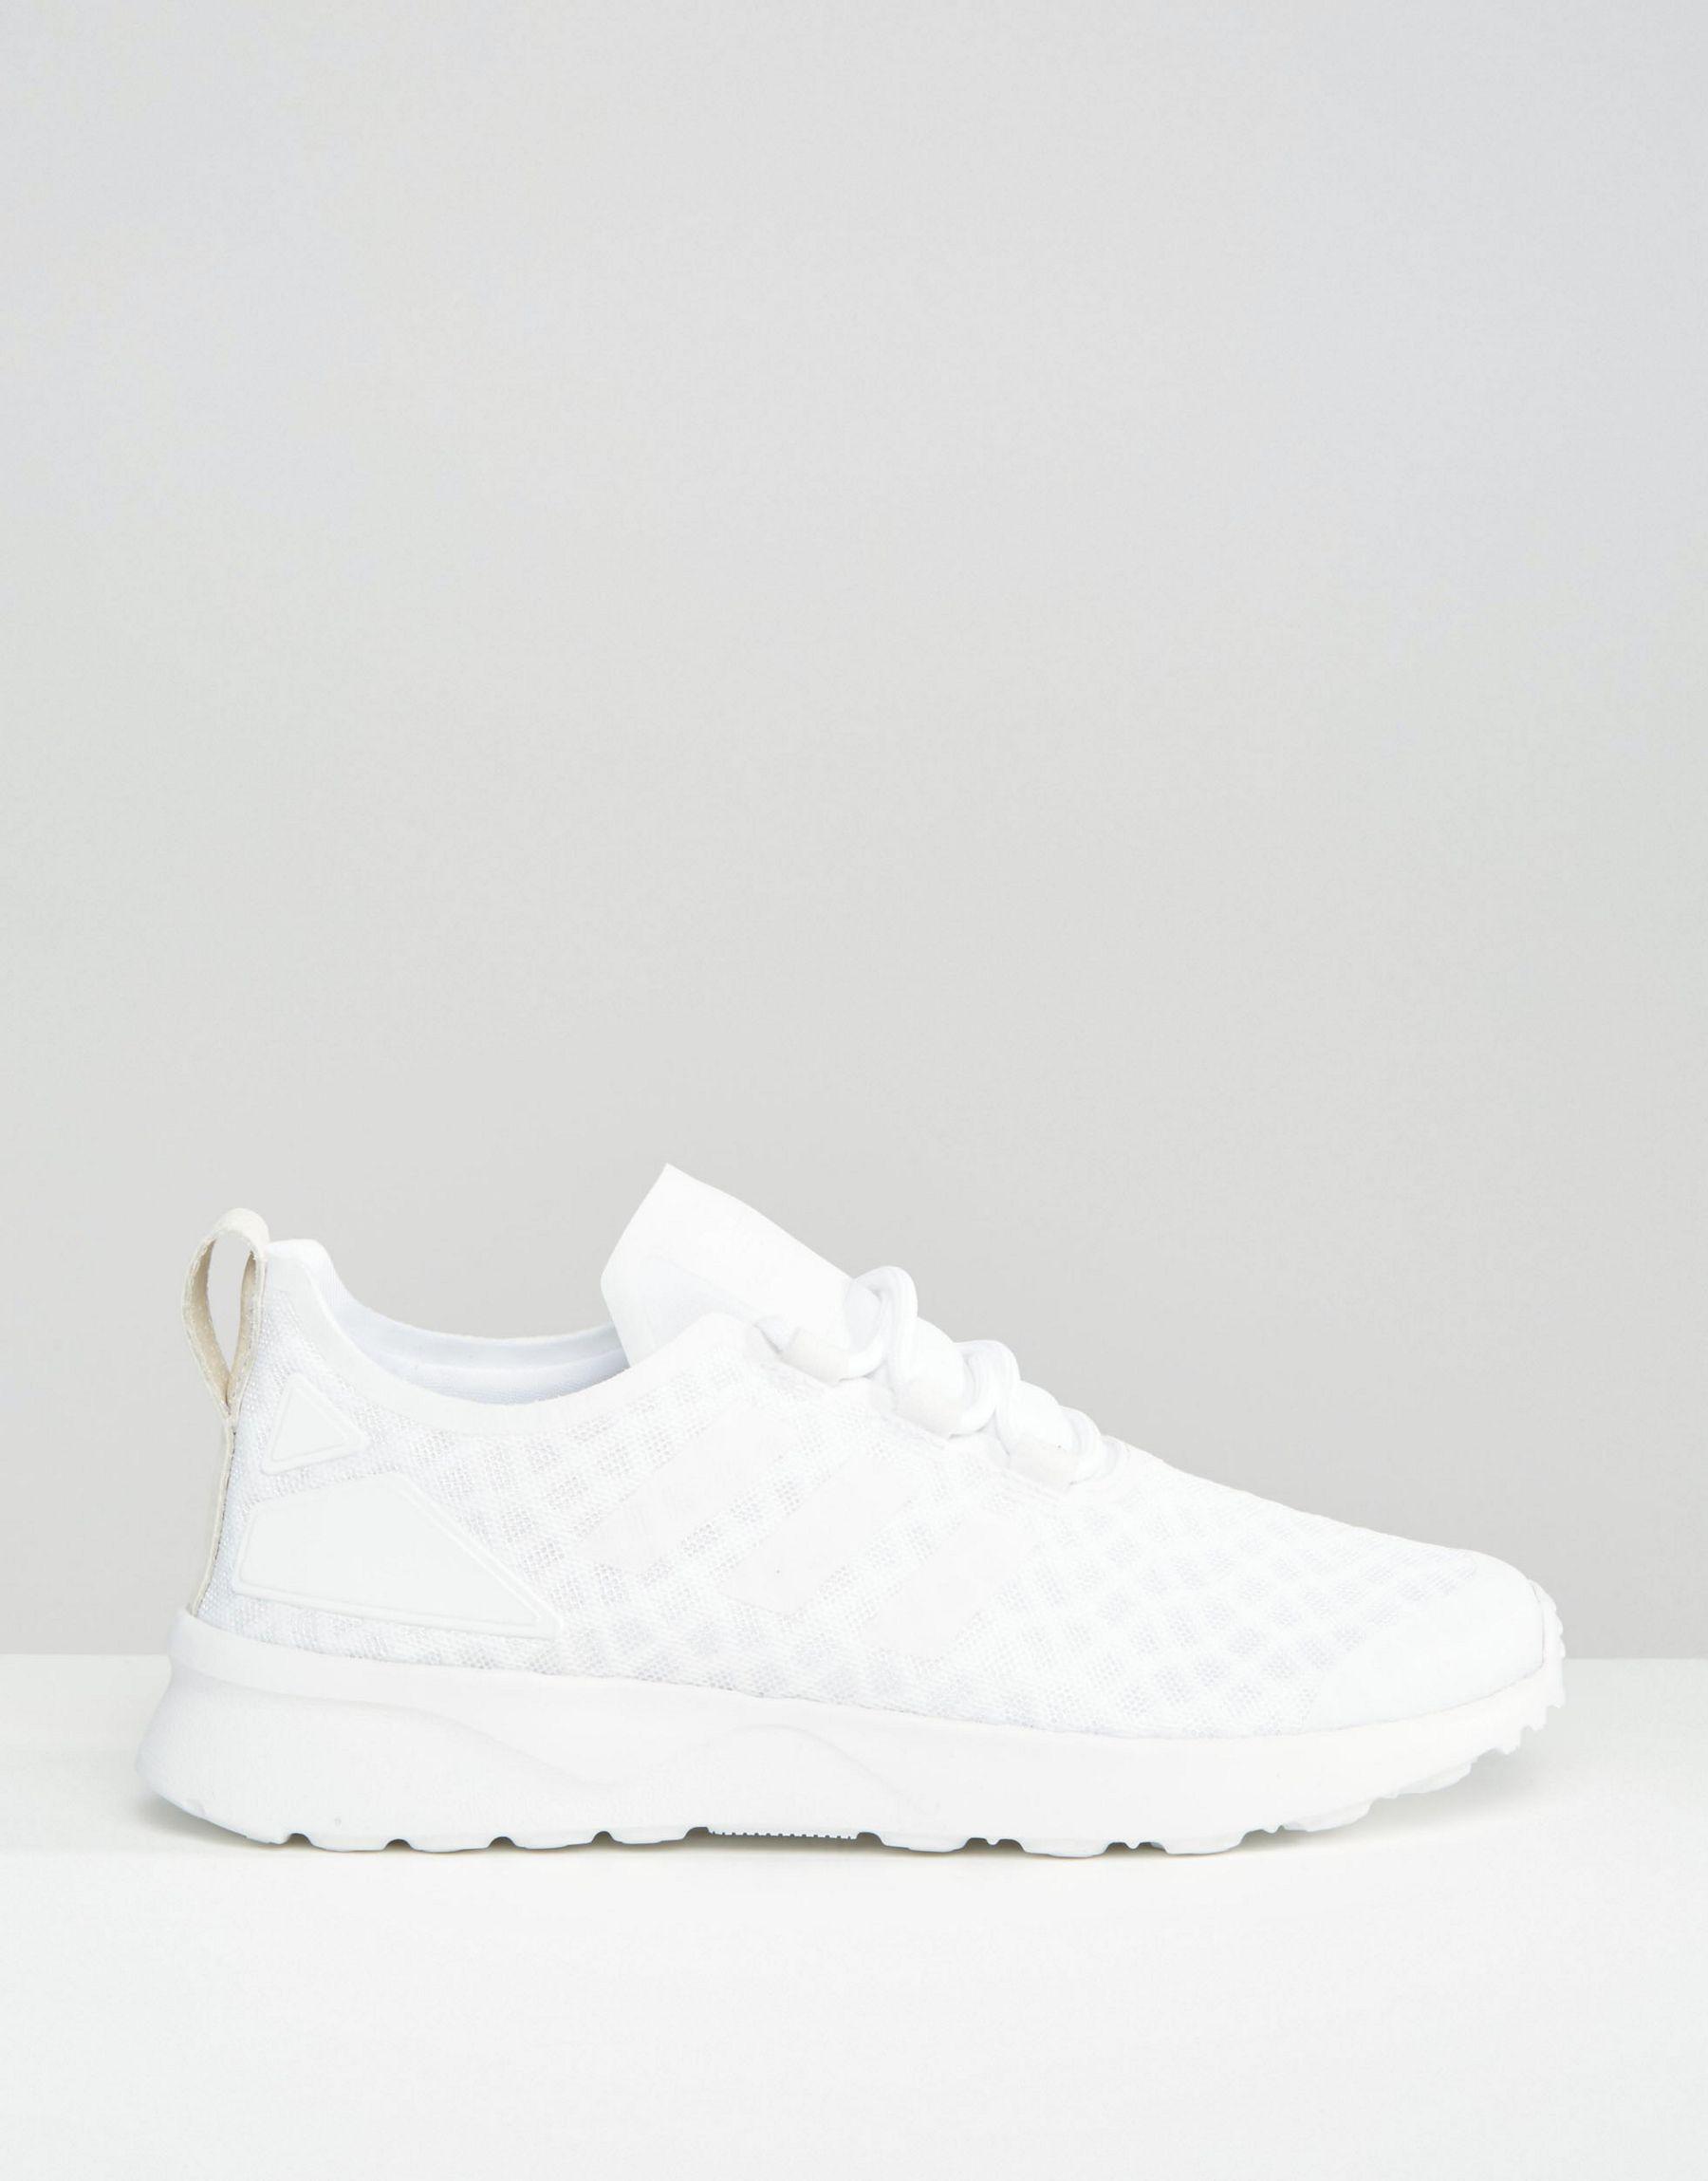 Lyst - adidas Originals Originals Off White Zx Flux Verve Mesh ... e10954c34f